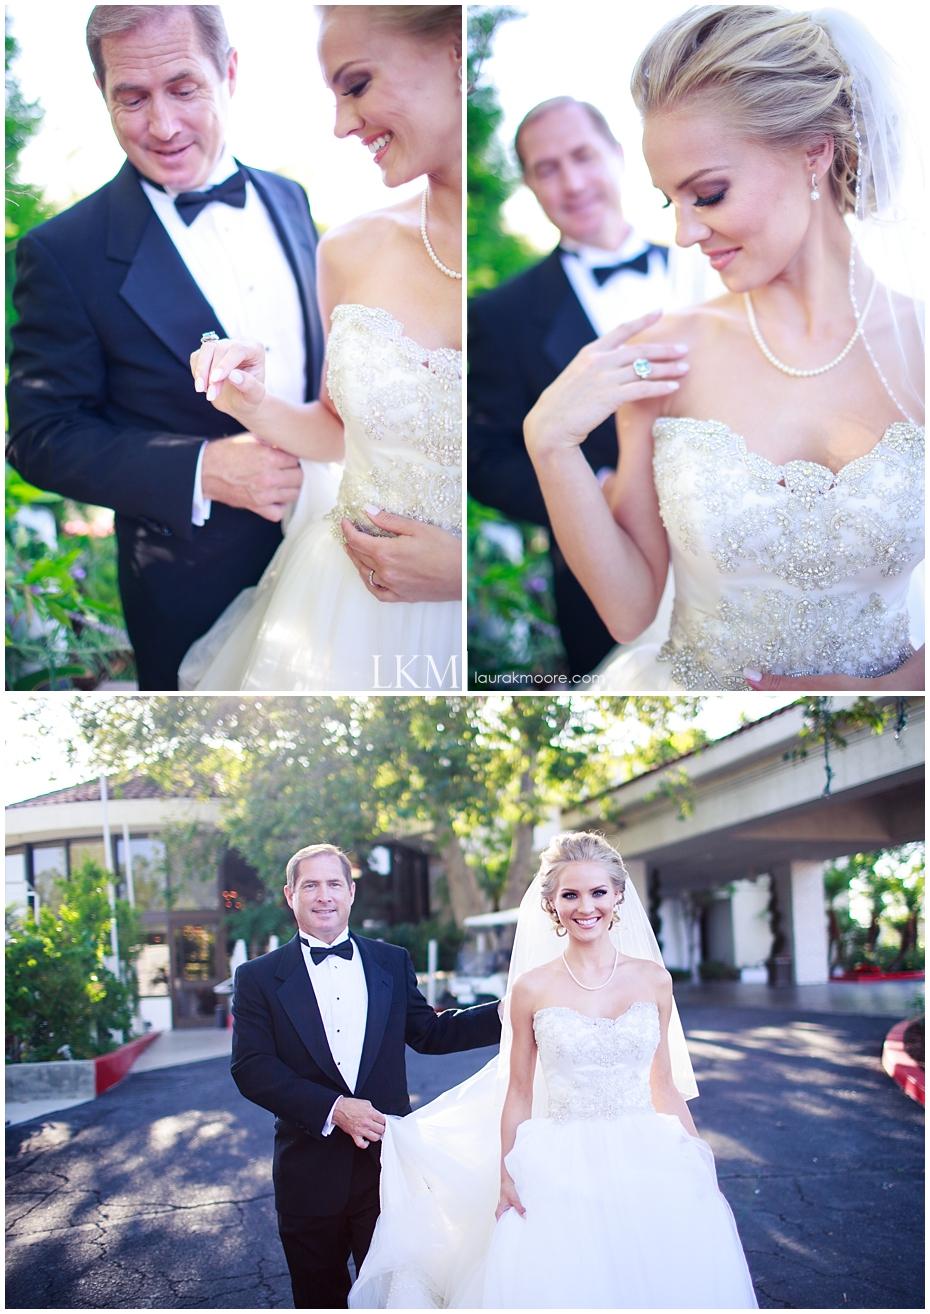 Kristen-Dalton-Celebrity-Wedding-Photography-The-Vineyards-Simi-Valley_0074.jpg